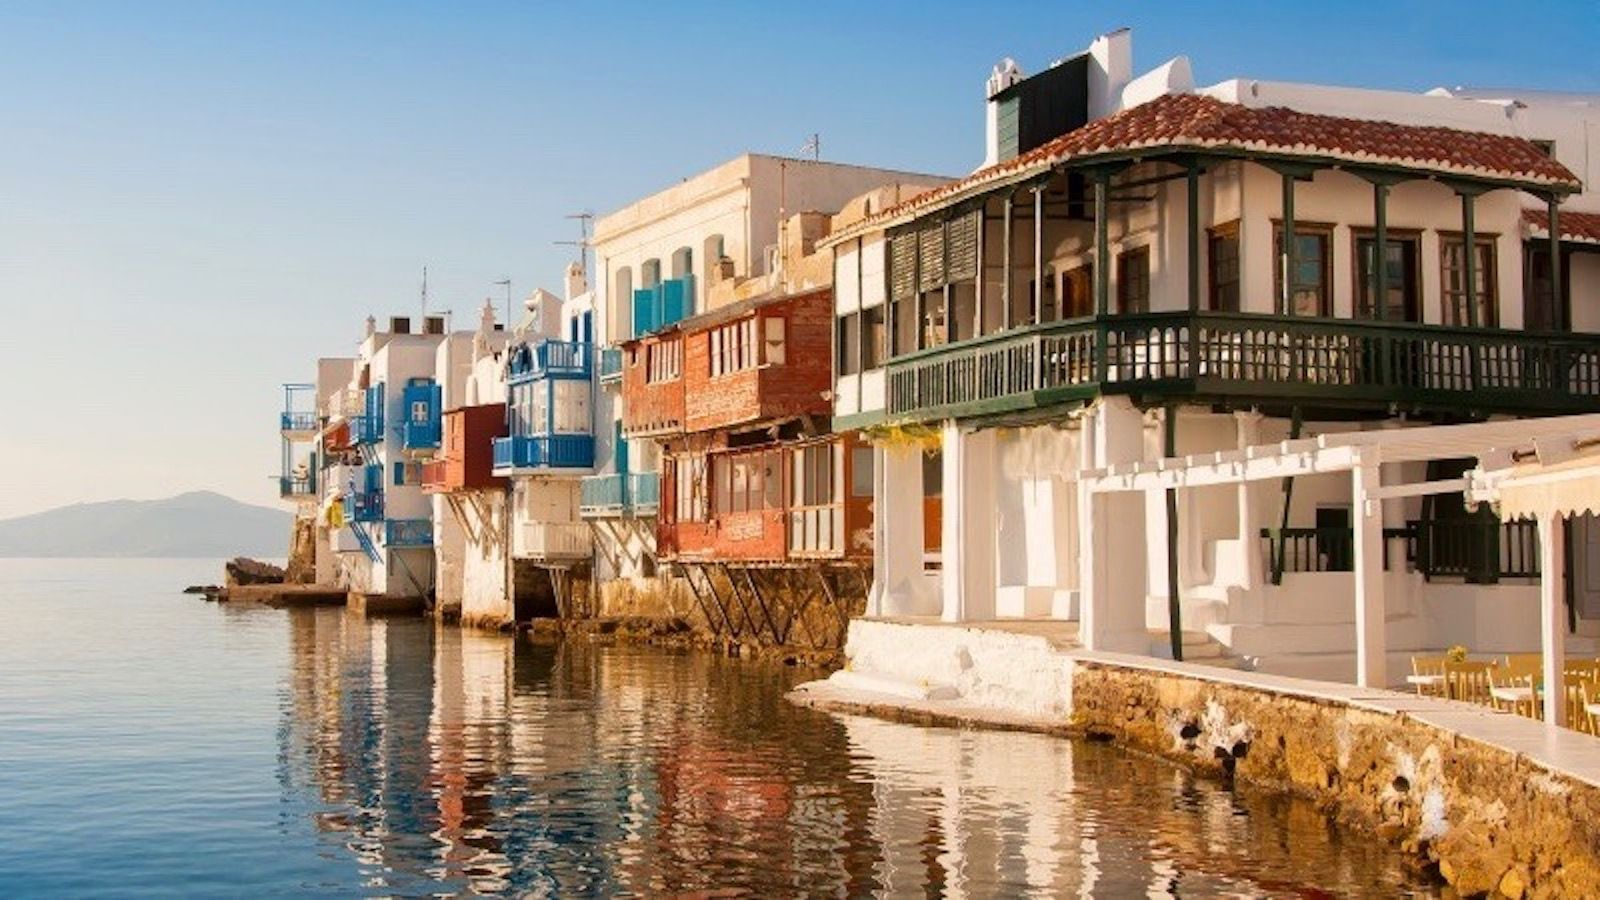 Copy-of-Little-Venice-at-sunset-on-Mykonos-Island-in-the-Mediterranean-Sea.-Greece.-950x450